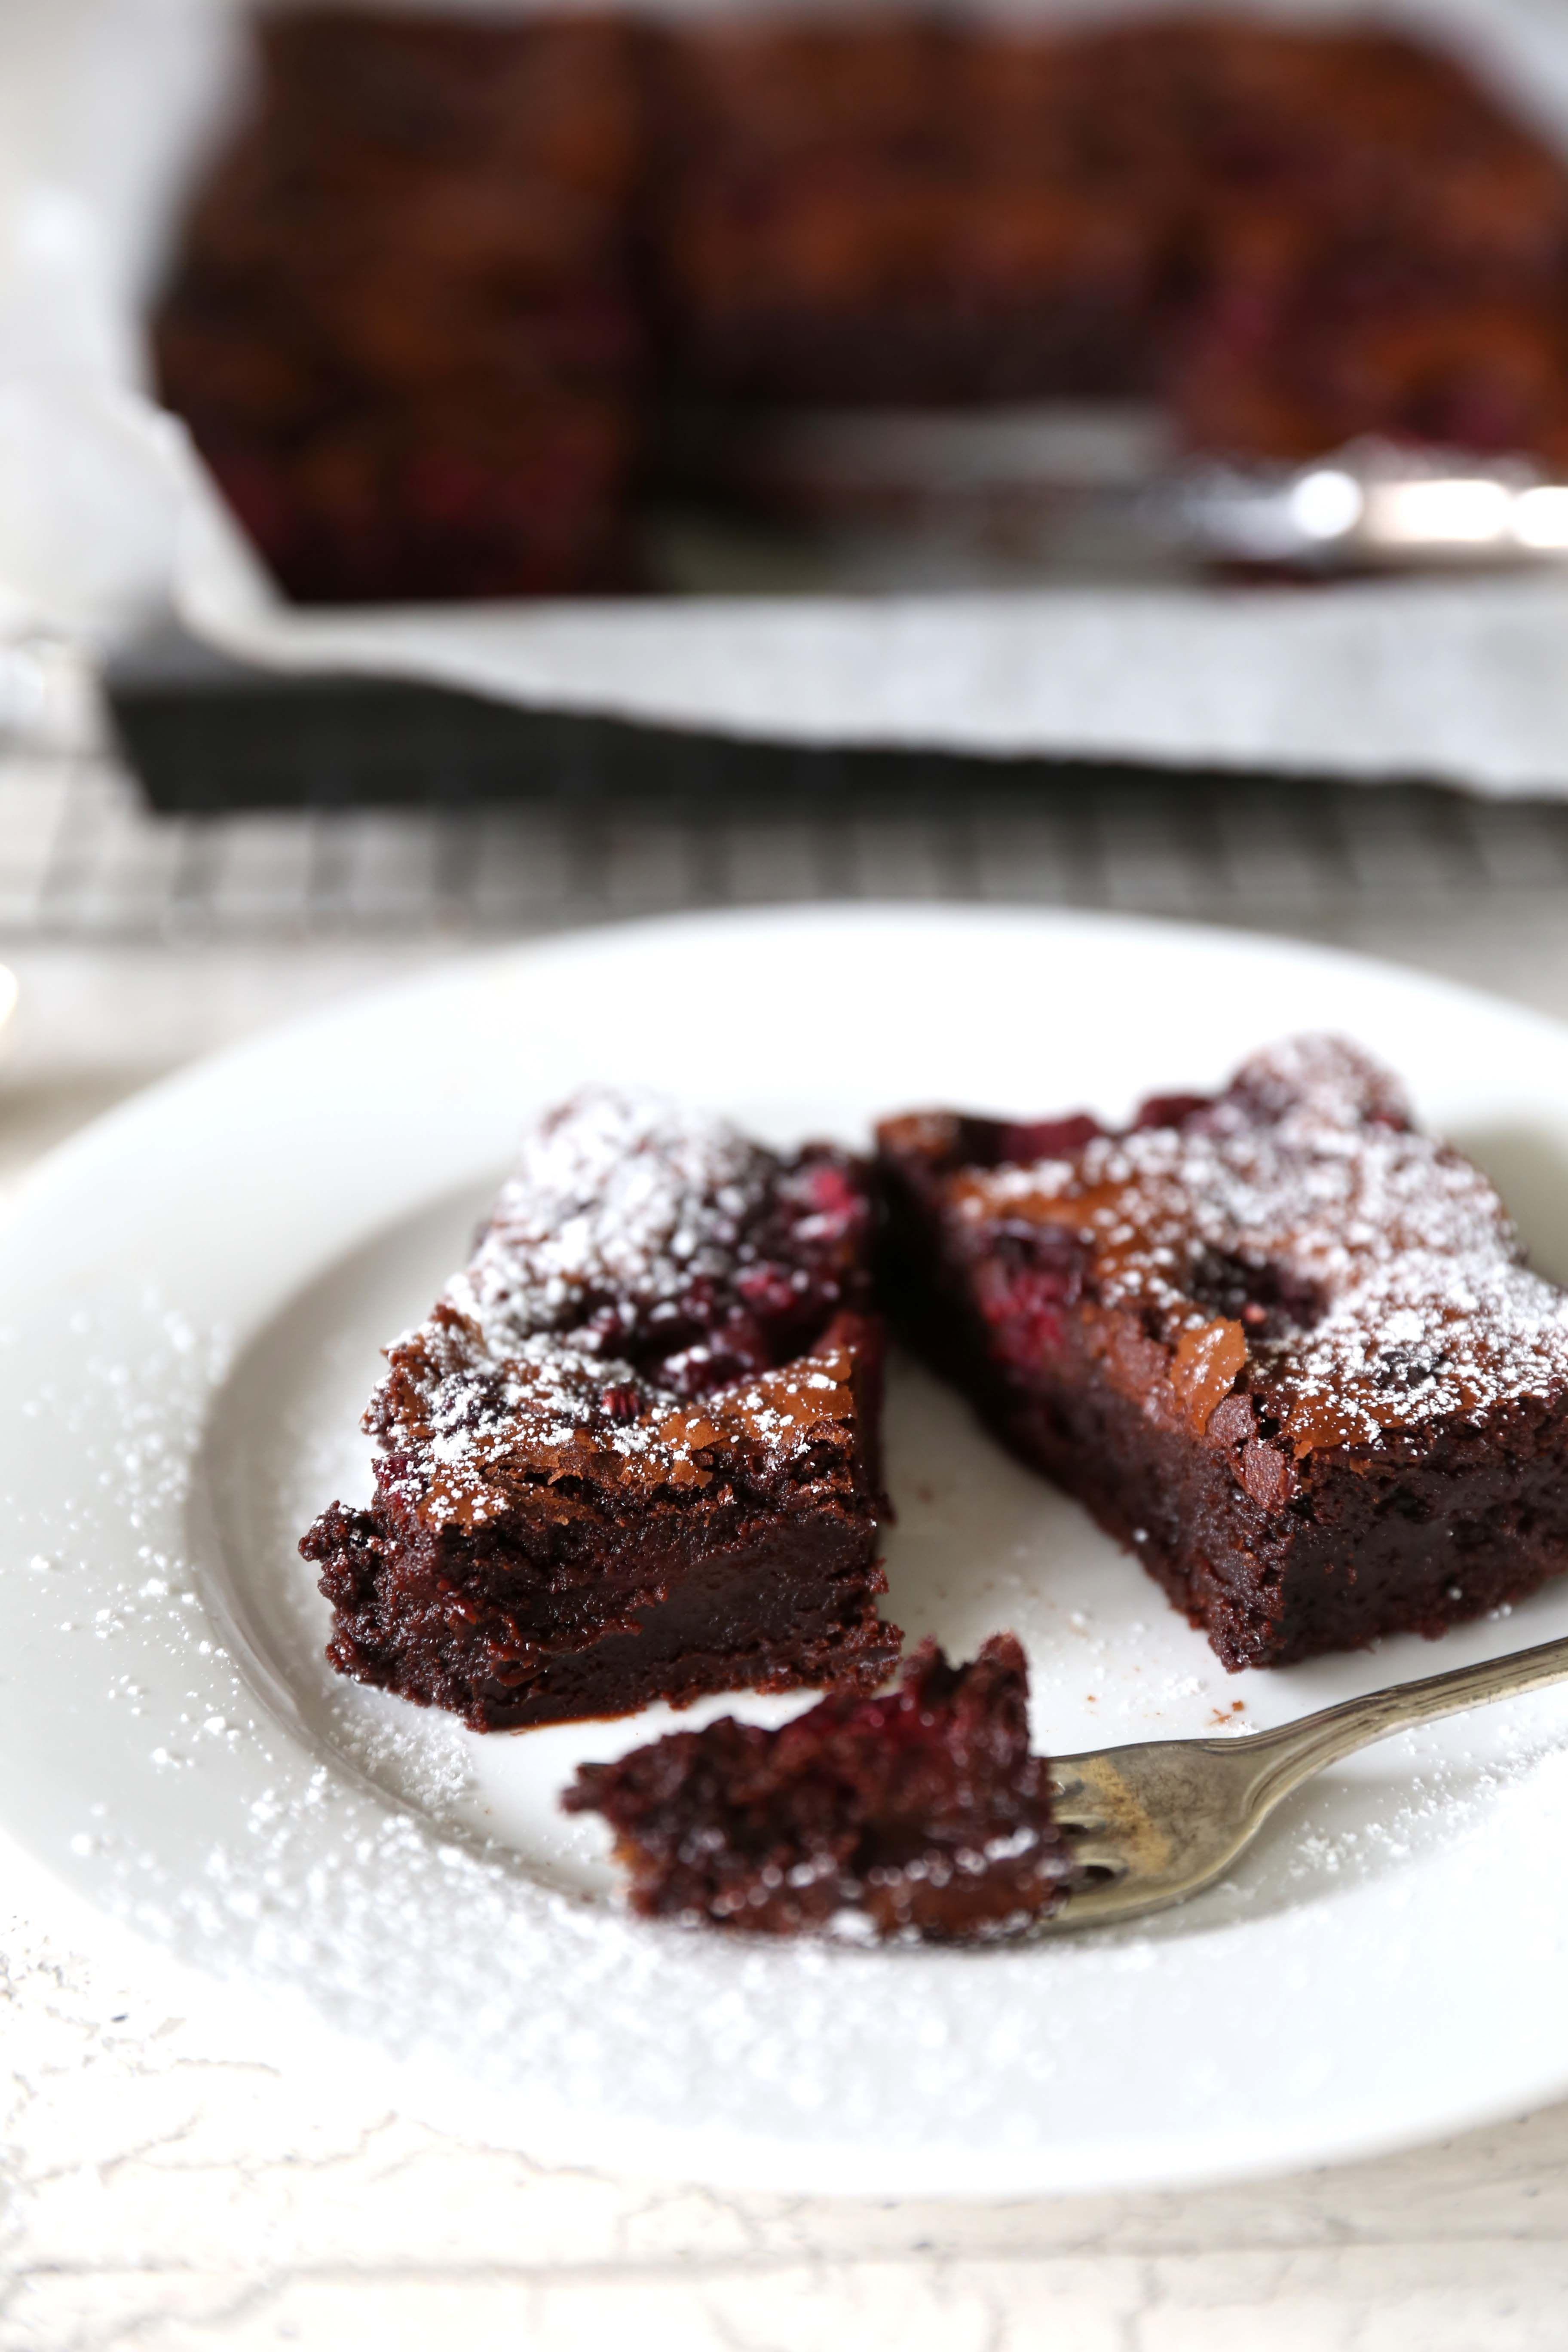 Decadent dark chocolate & raspberry brownie 2- swoon food.com